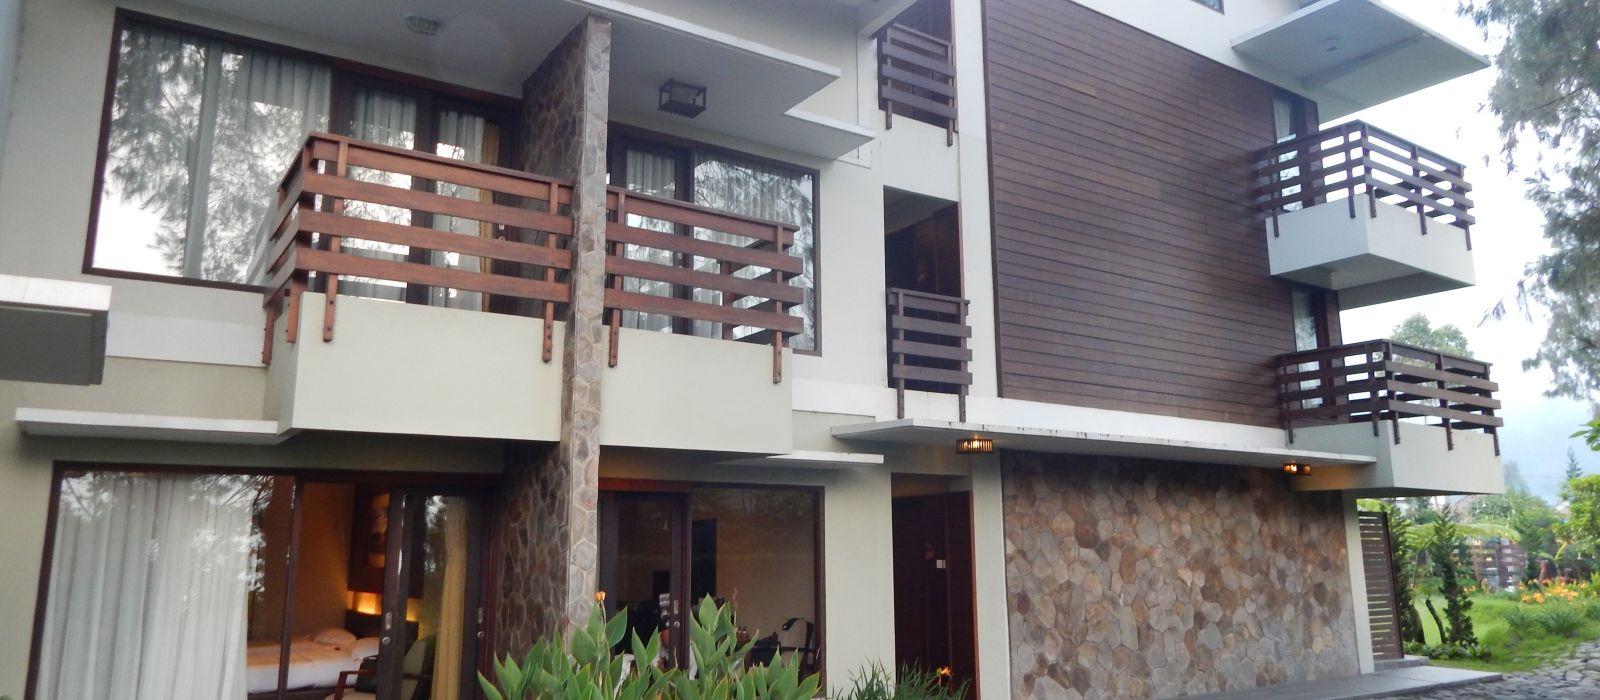 Hotel Jiwa Jawa Resort Bromo Indonesia